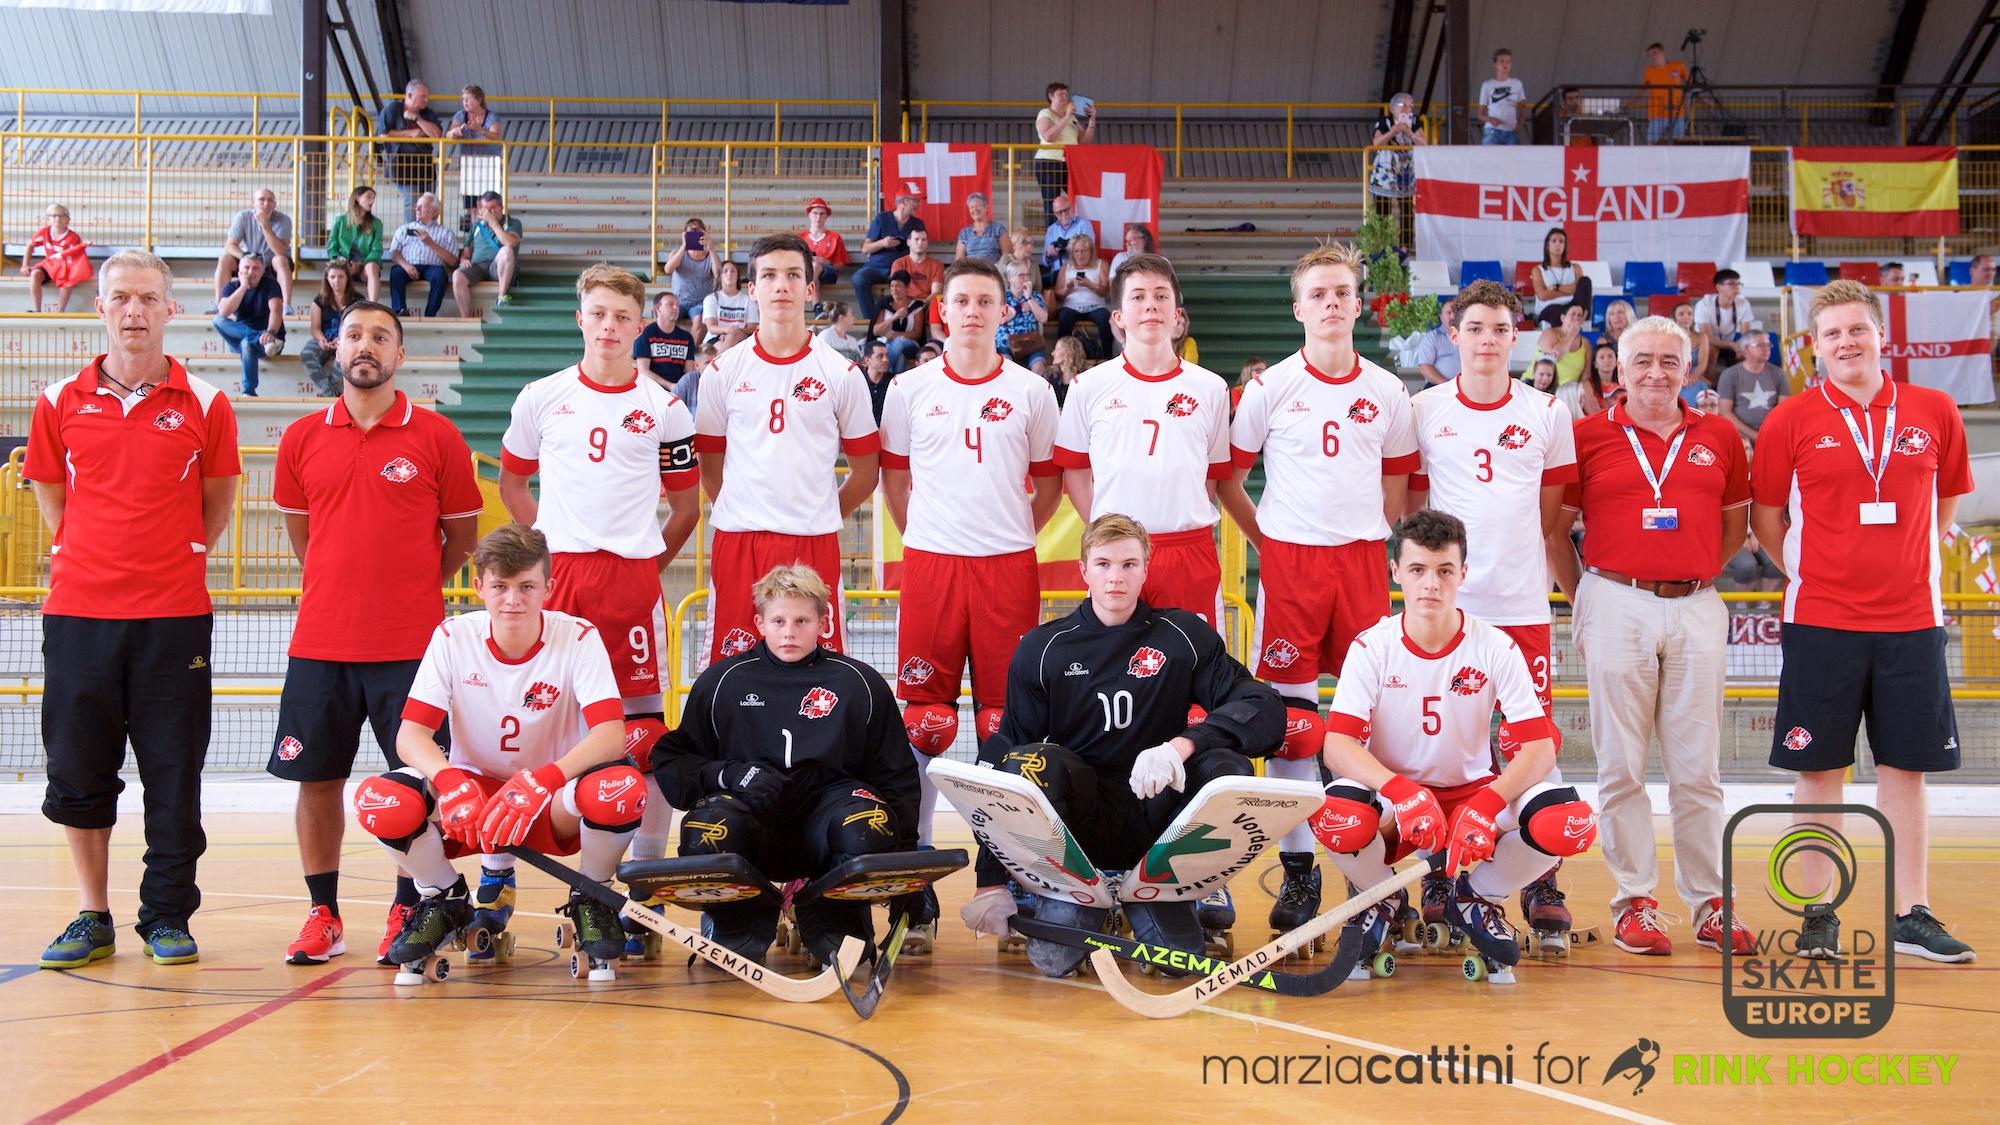 18-09-02-2Spain-Switzerland02